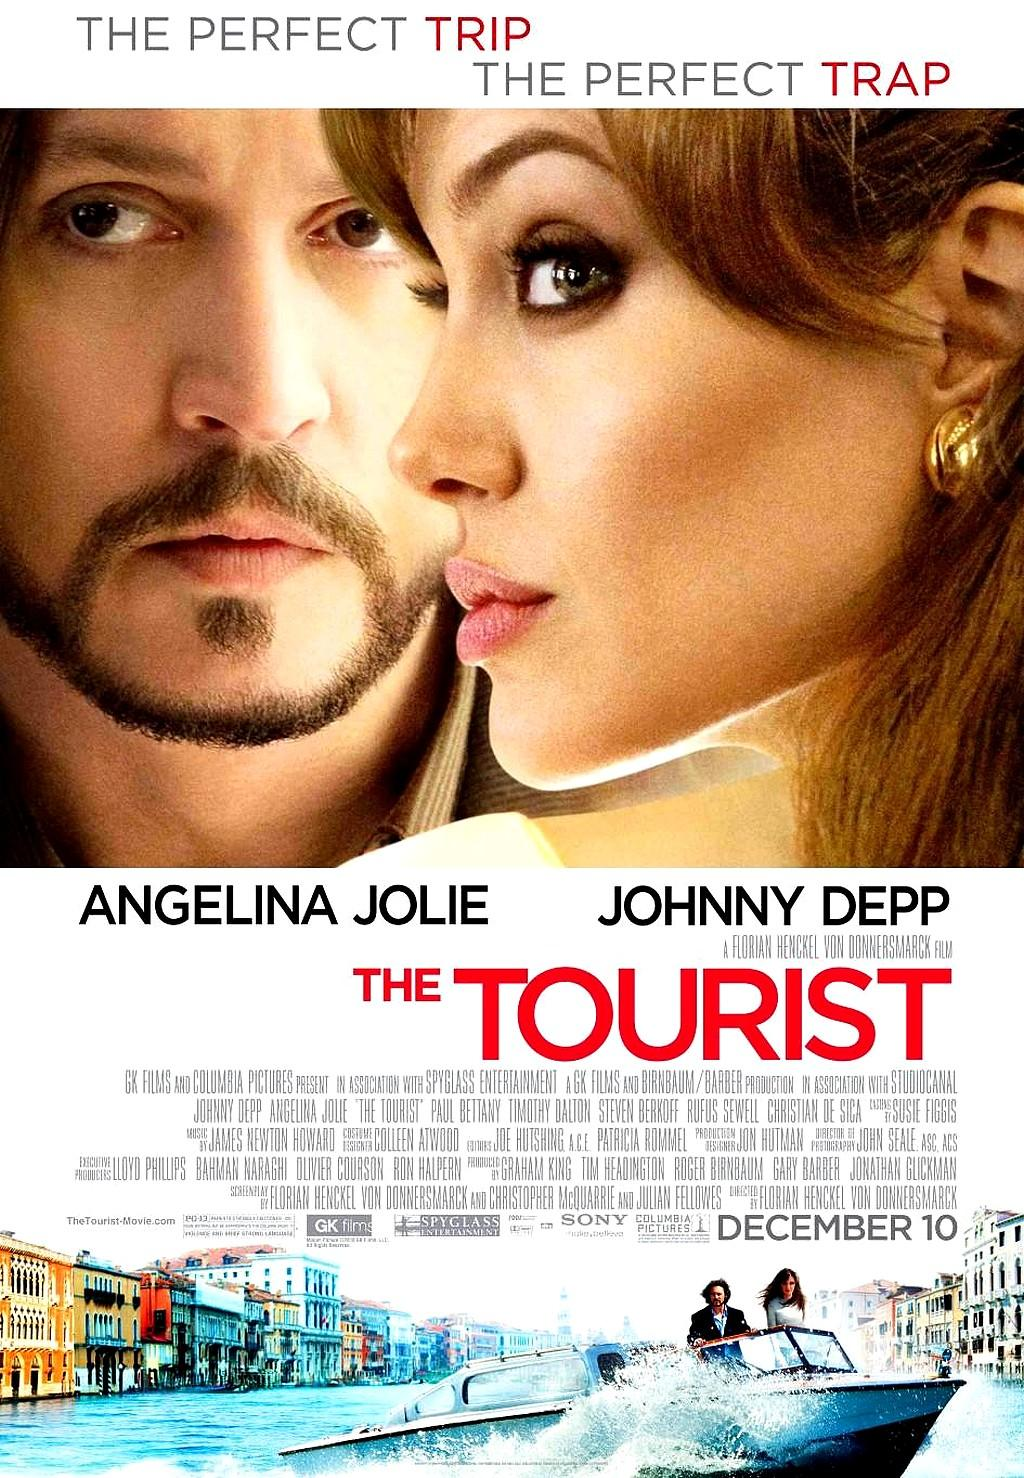 Xem phim Du Khách Bí Ẩn - The Tourist 2010